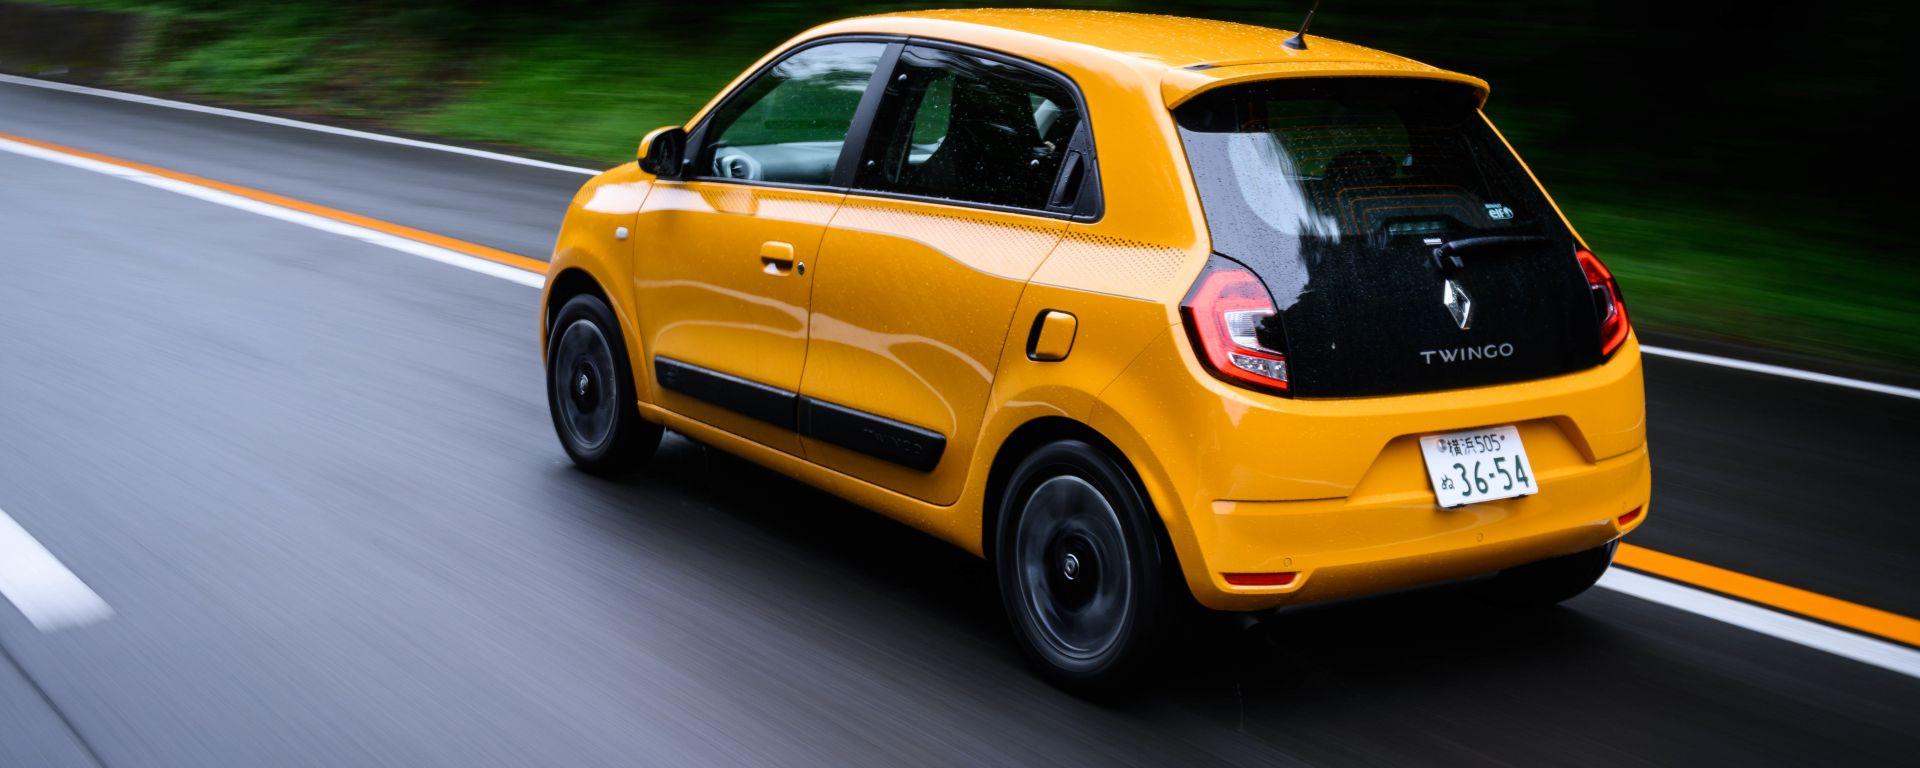 Adieu Renault Twingo